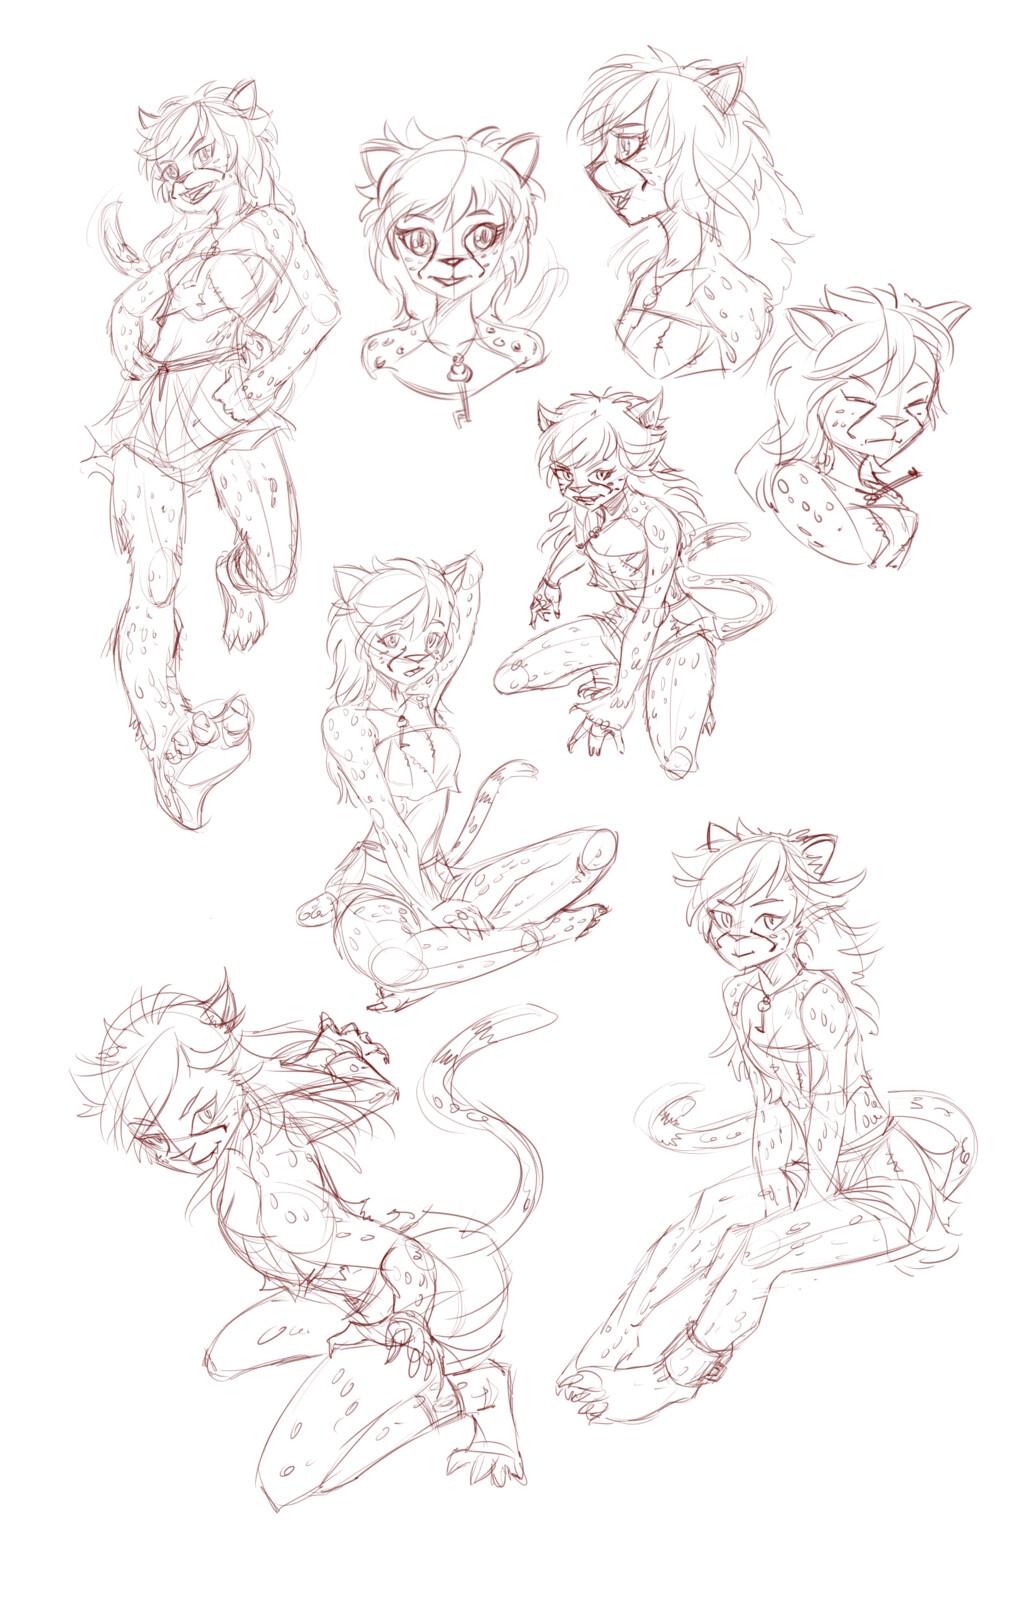 Runt, Character sheet